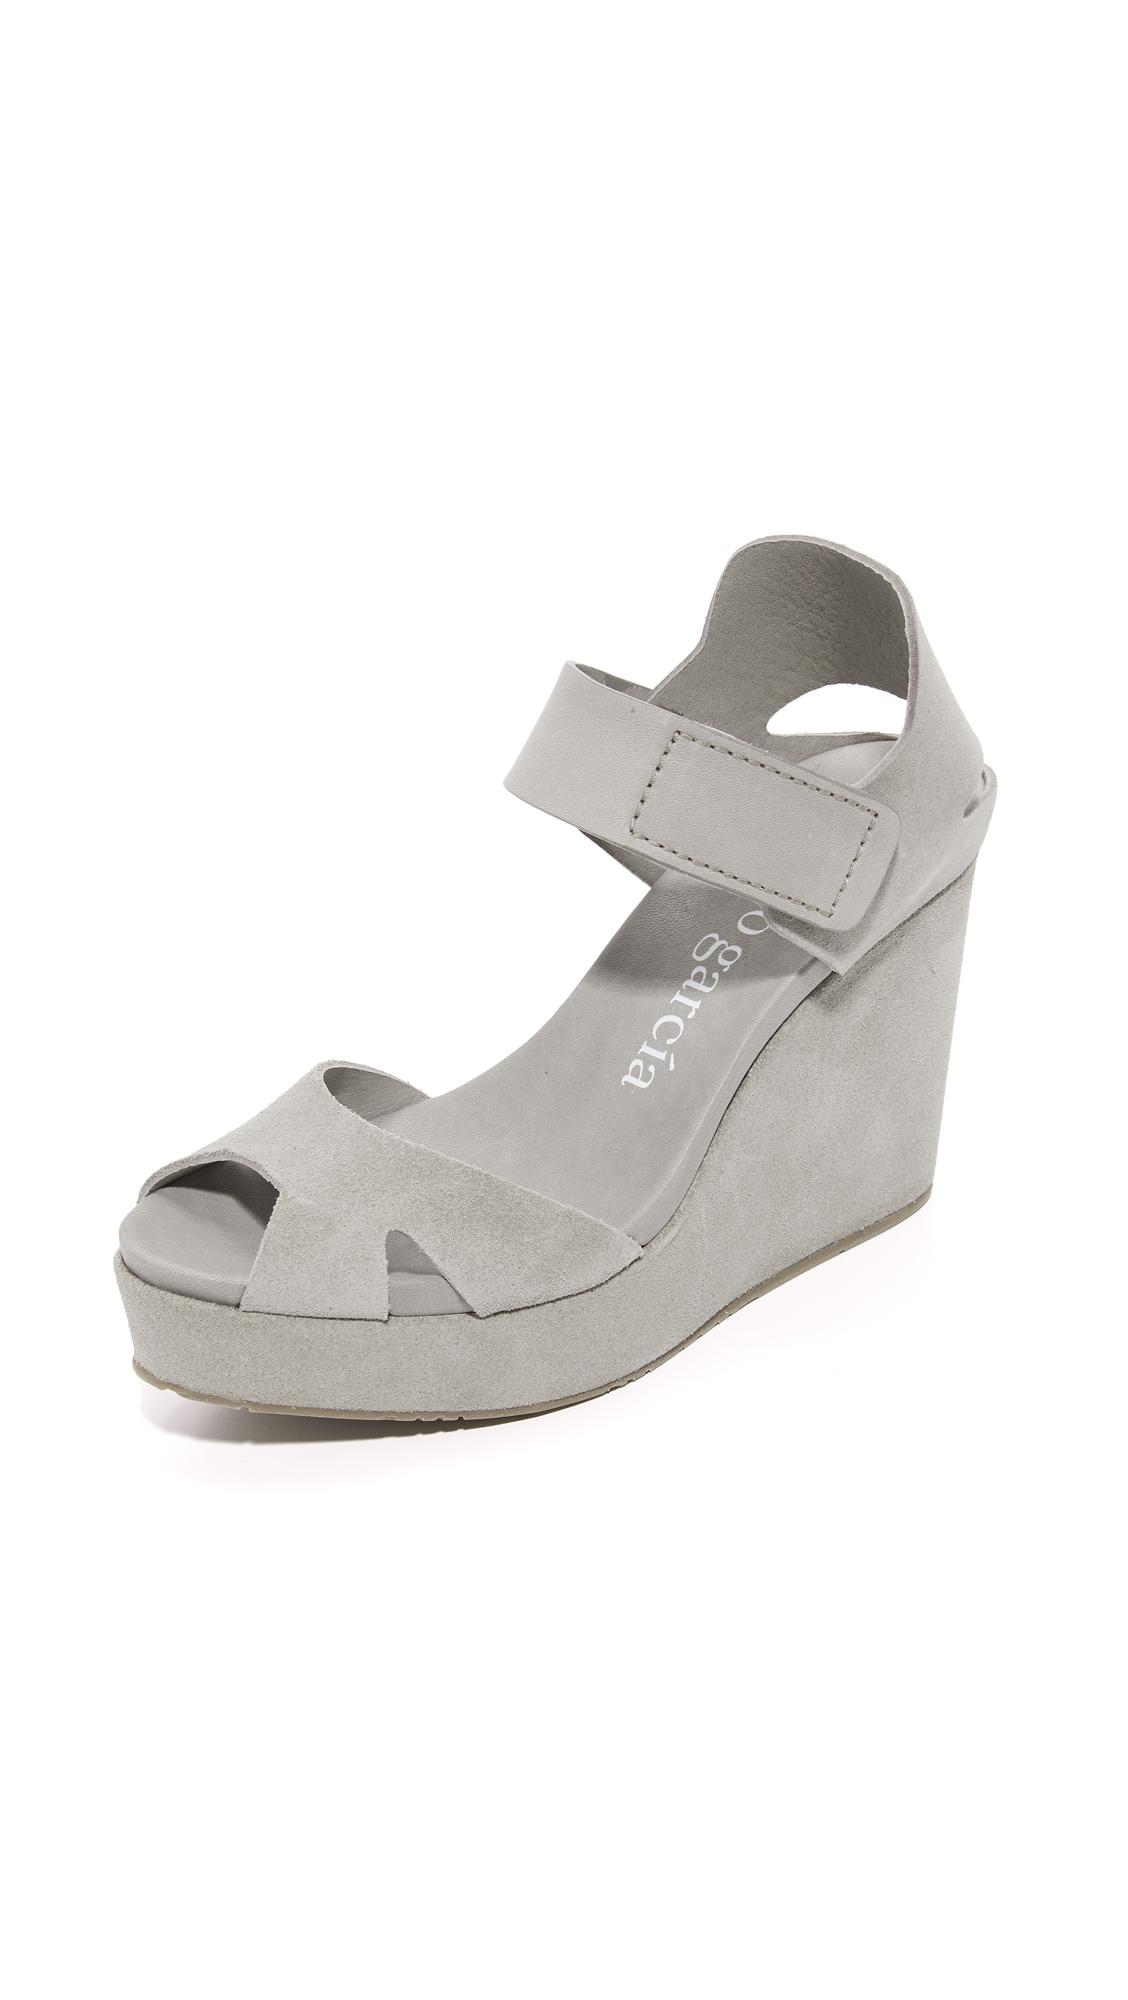 Where To Buy Malu Shoes